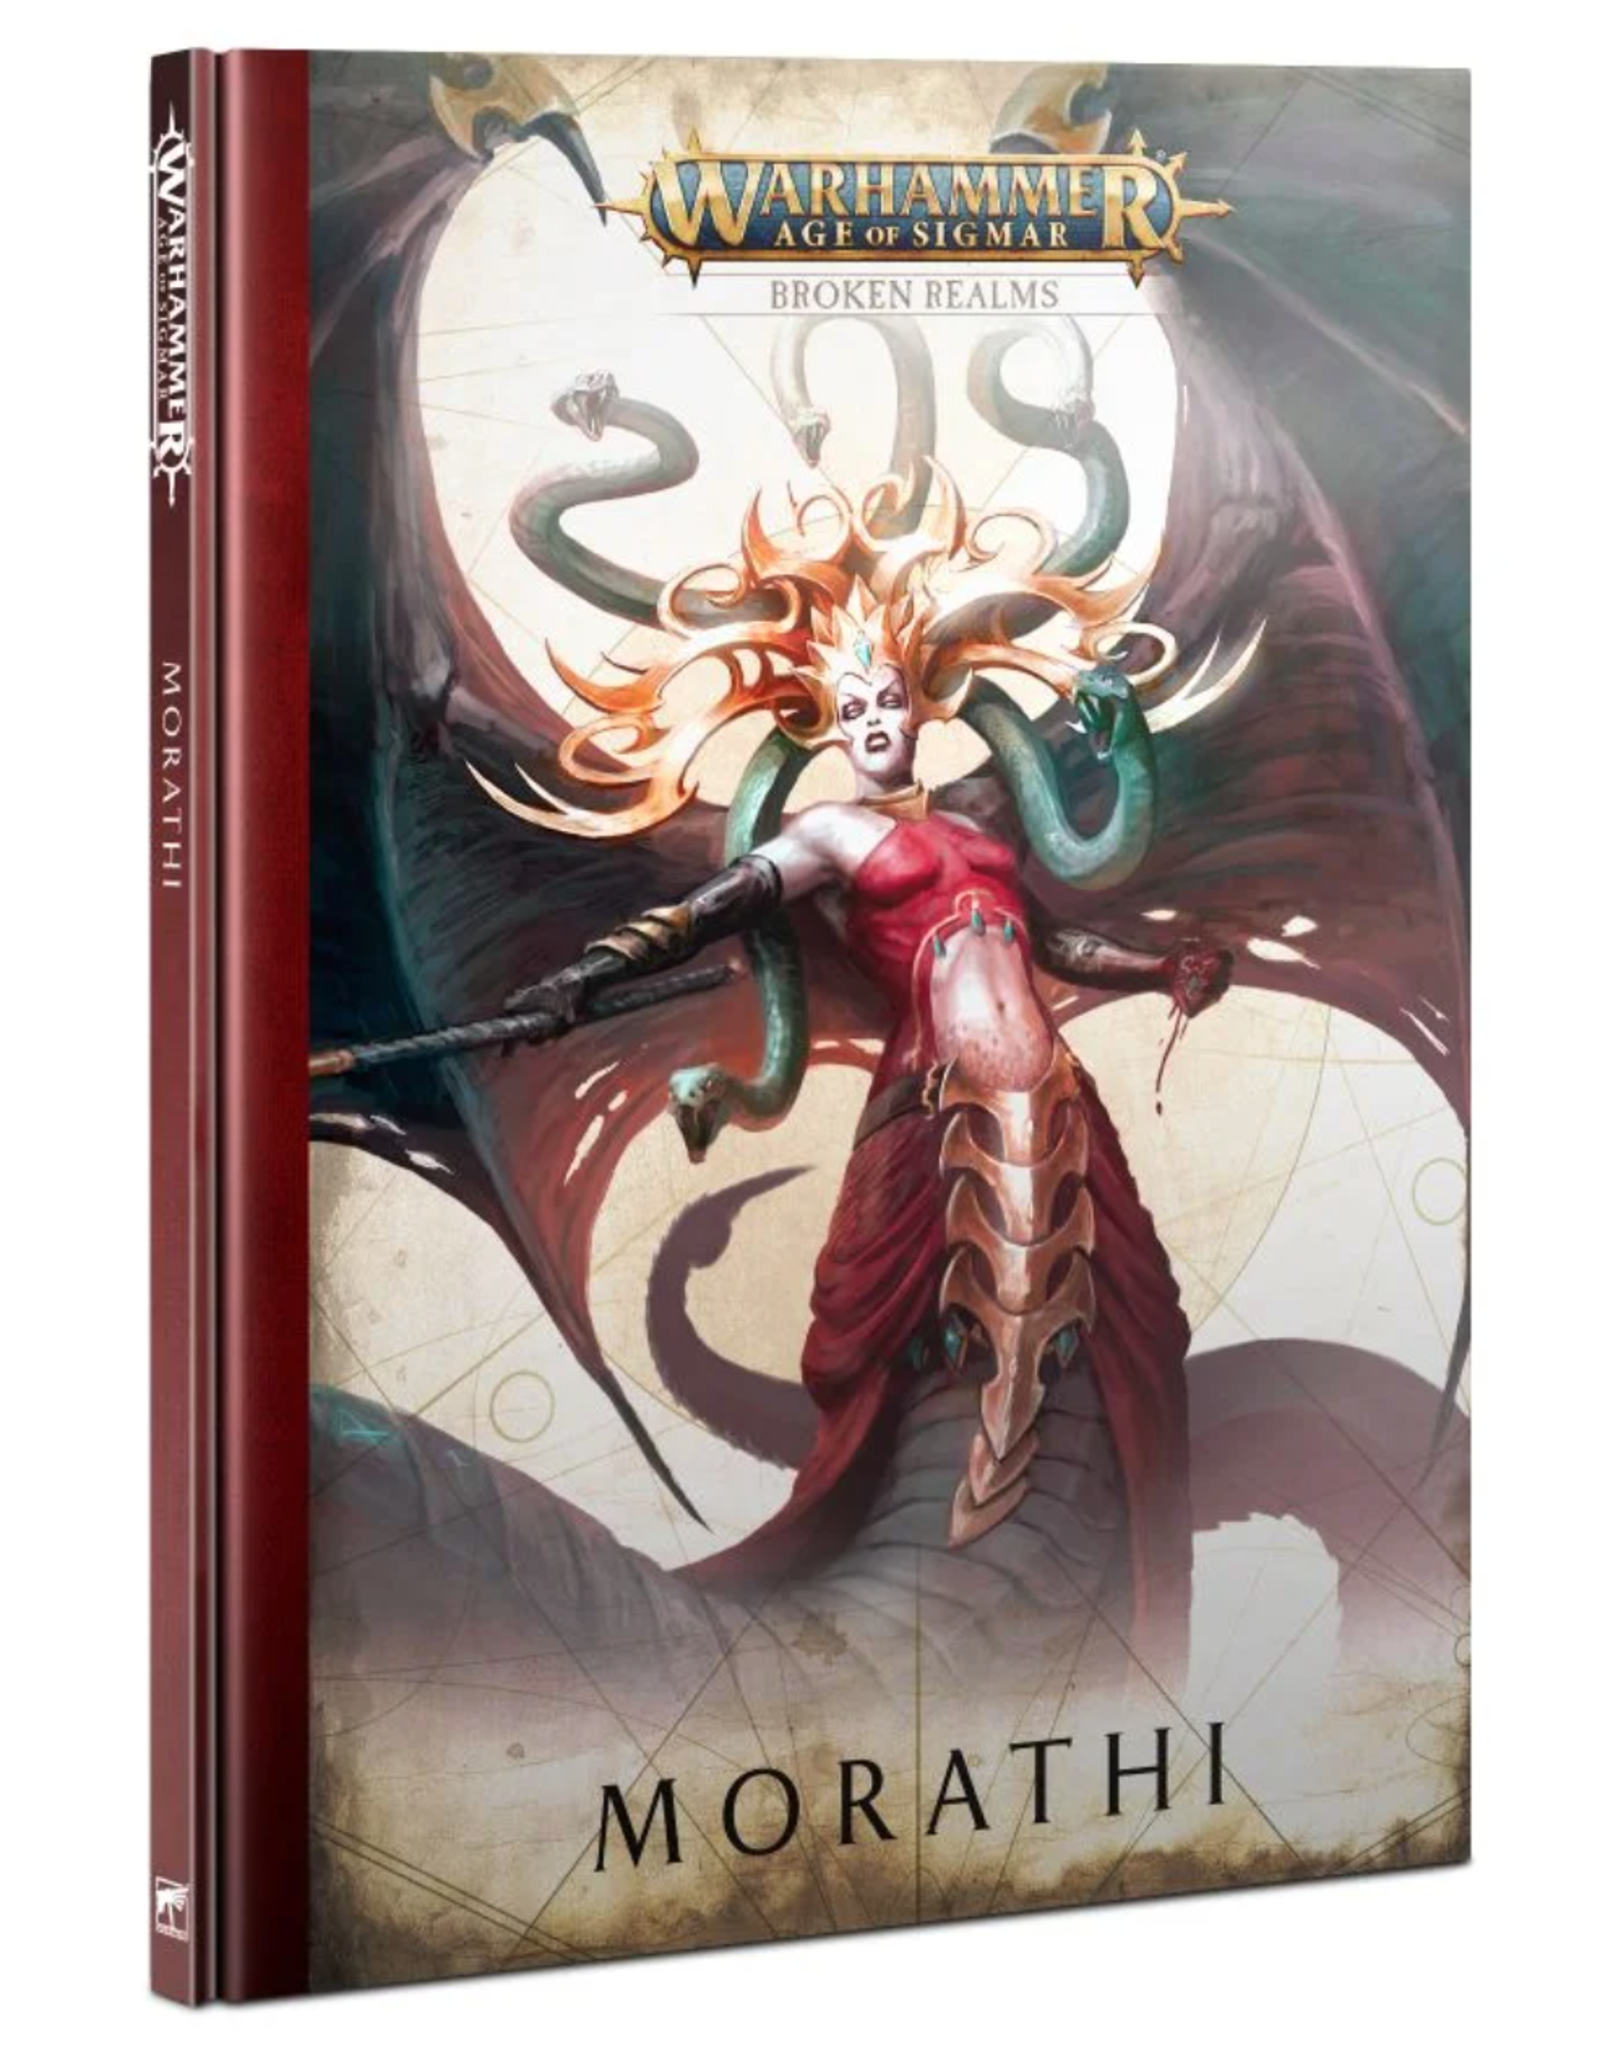 Age of Sigmar Broken Realms: Morathi